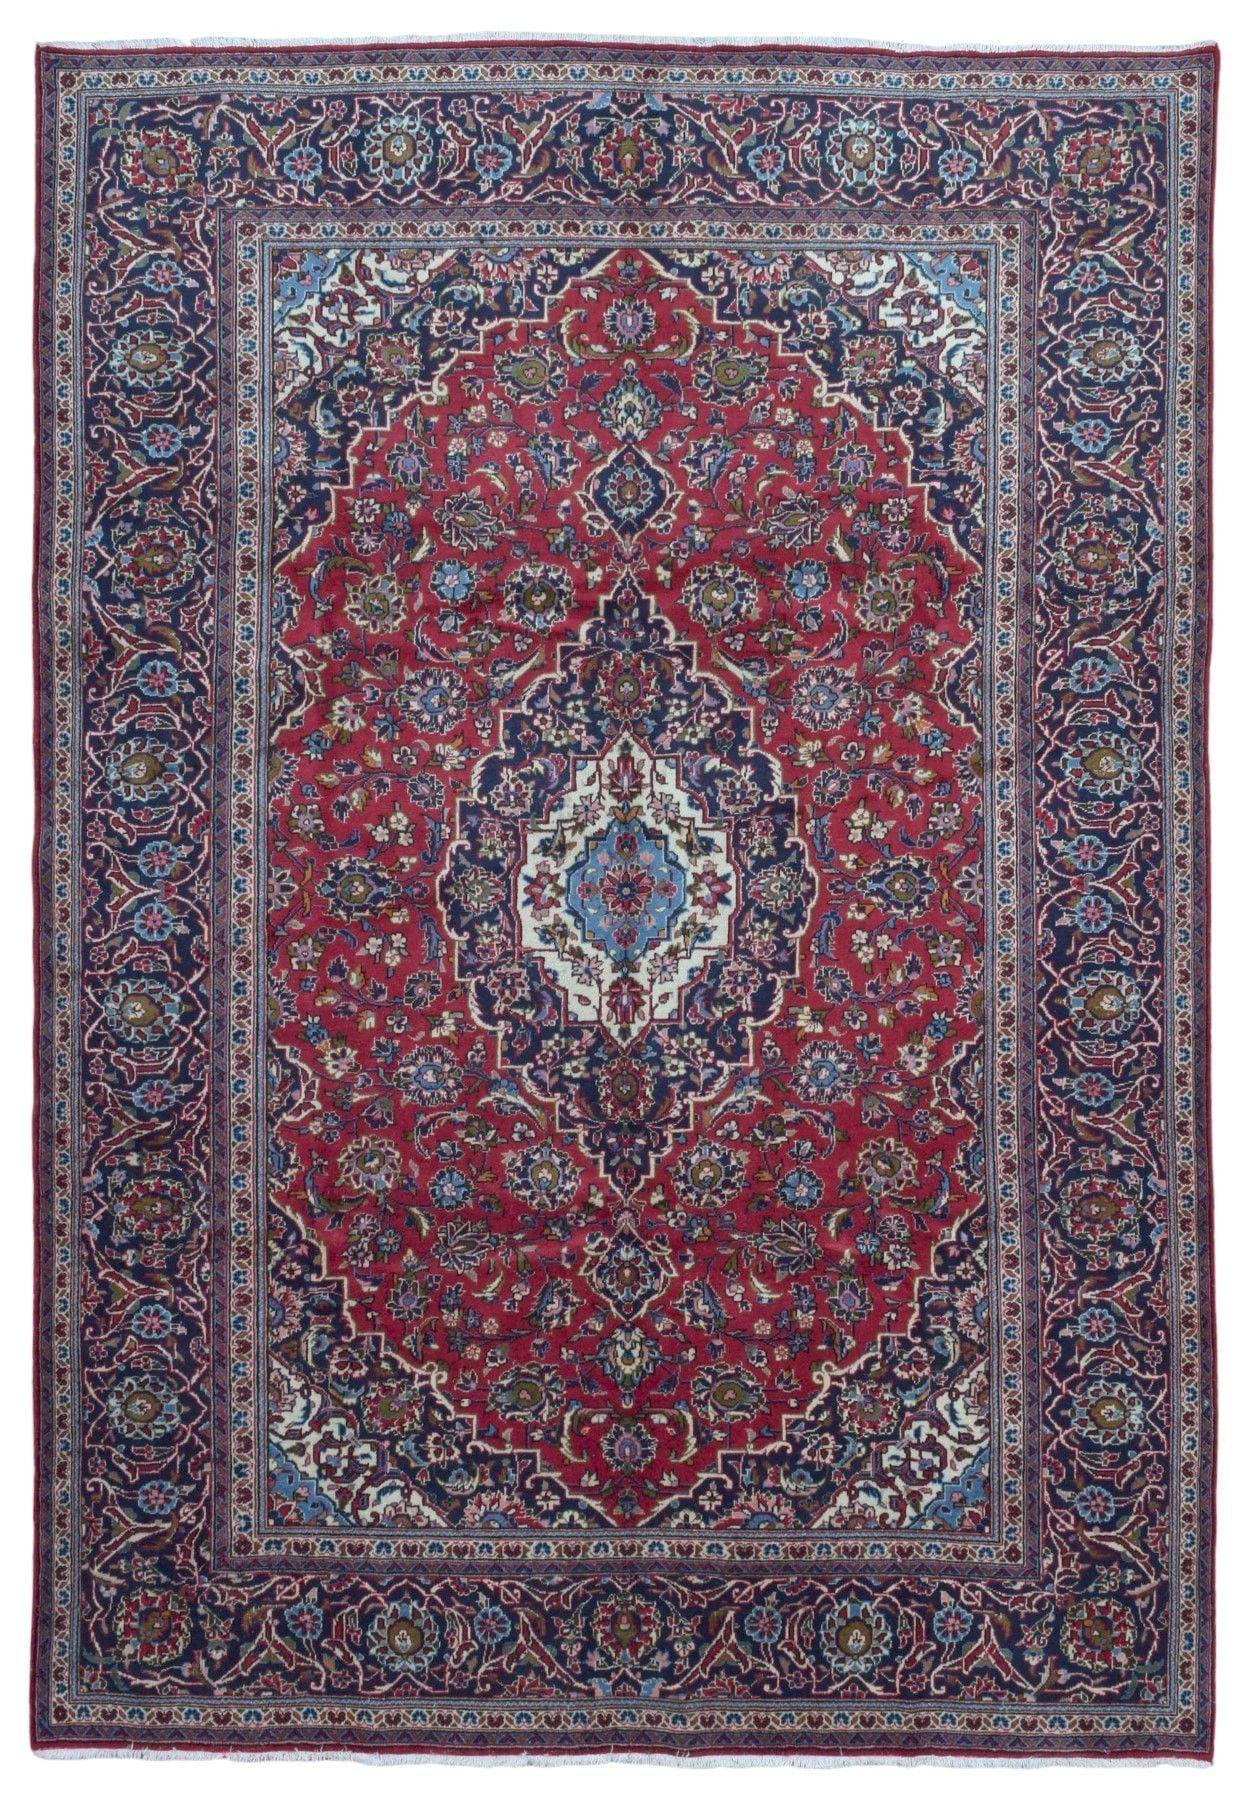 Semi-Antique Persian Kashan Oriental Rug 8X11'6